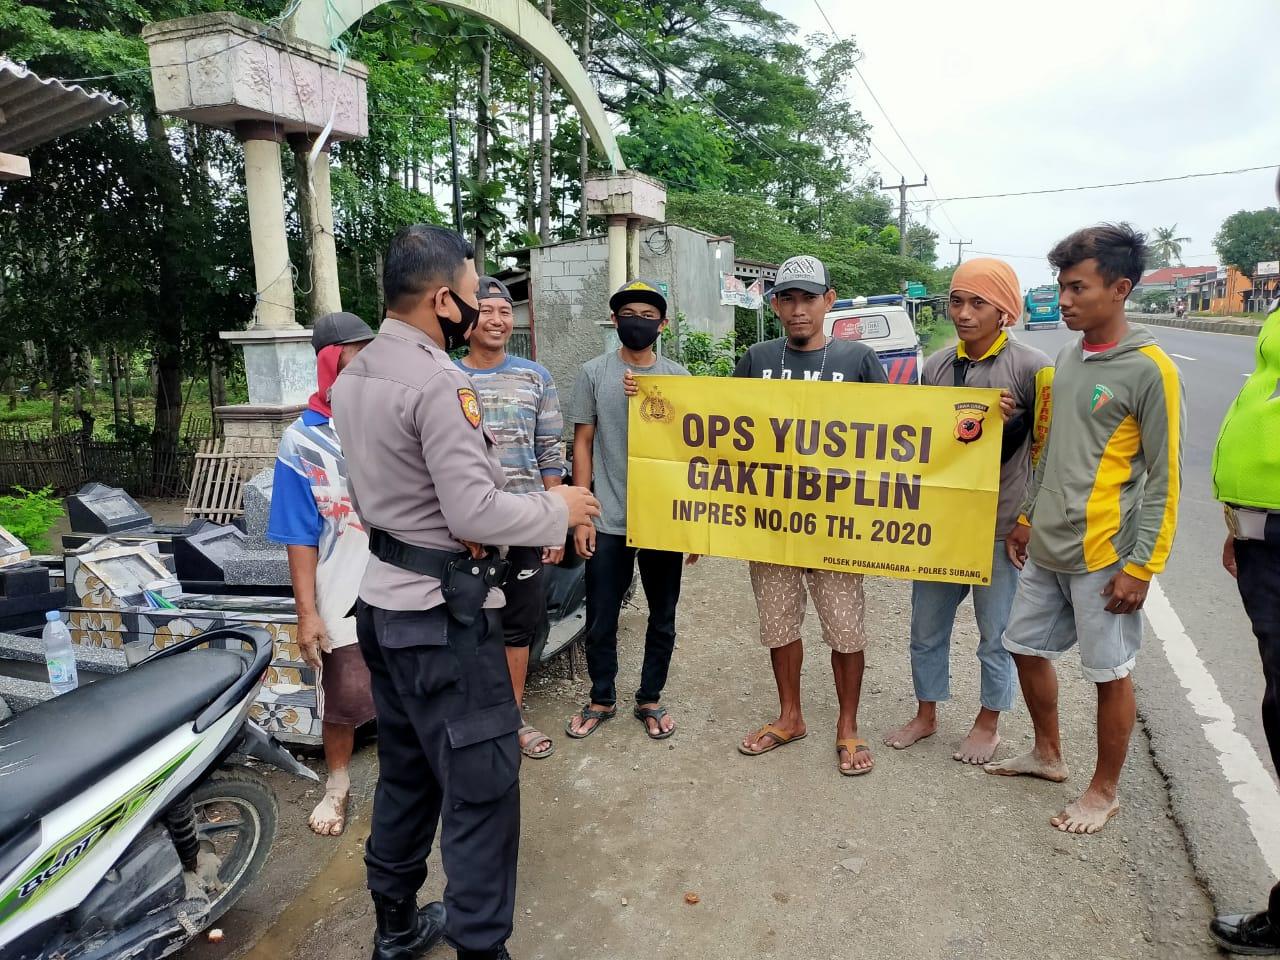 Polres Subang Polda Jabar Gelar Kegiatan PPKM dan Ops Yustisi